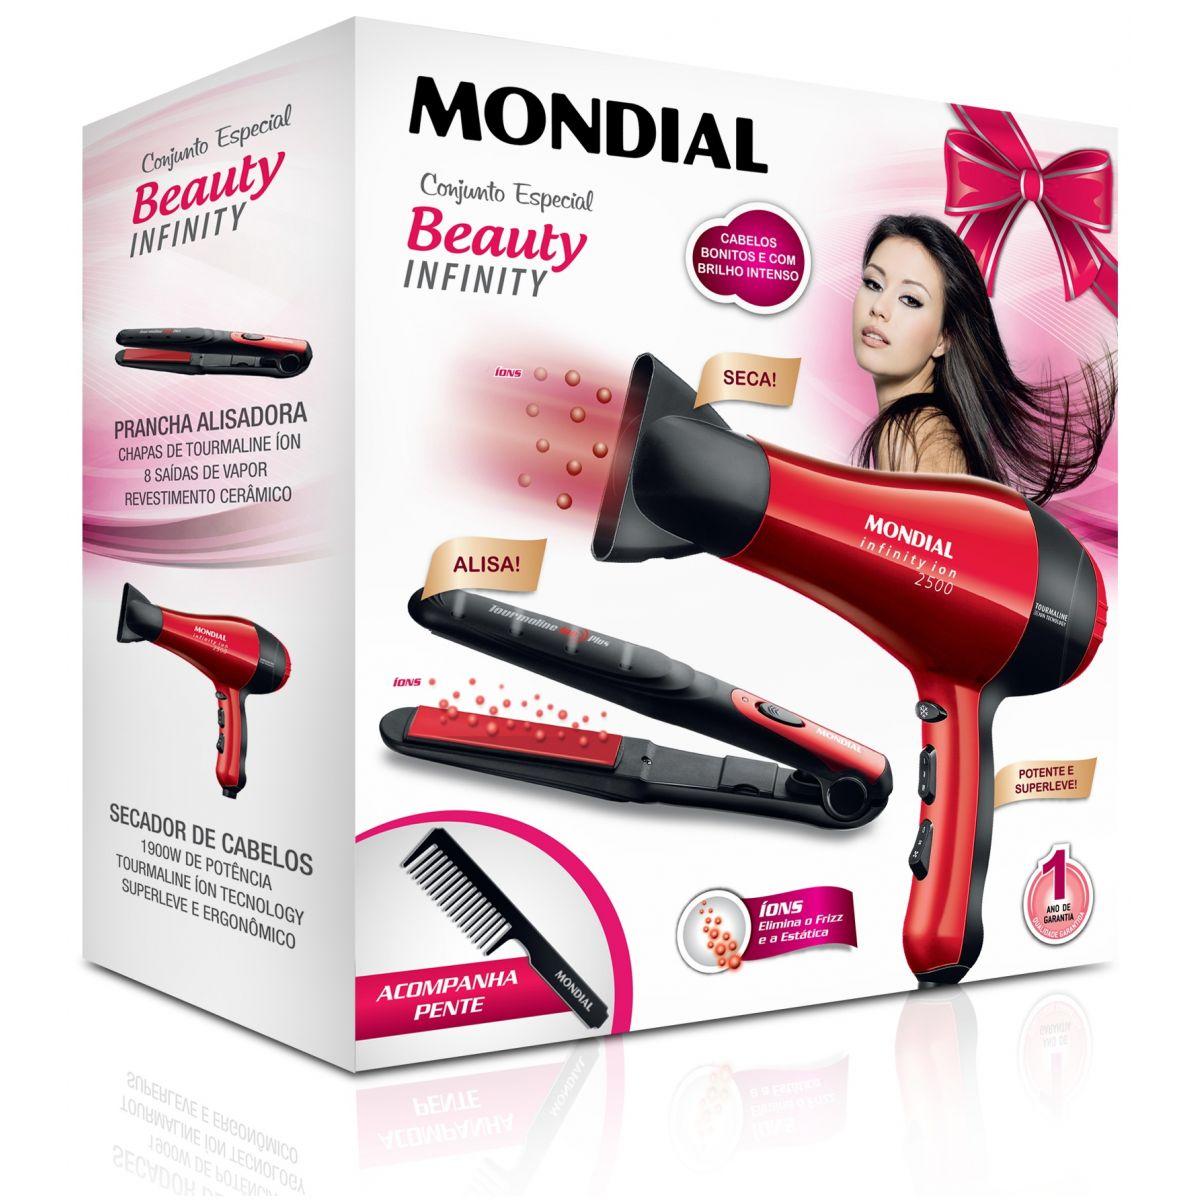 Conjunto Especial Beuty Infinity Mondial KT-44 - Secador + Prancha  - ShopNoroeste.com.br